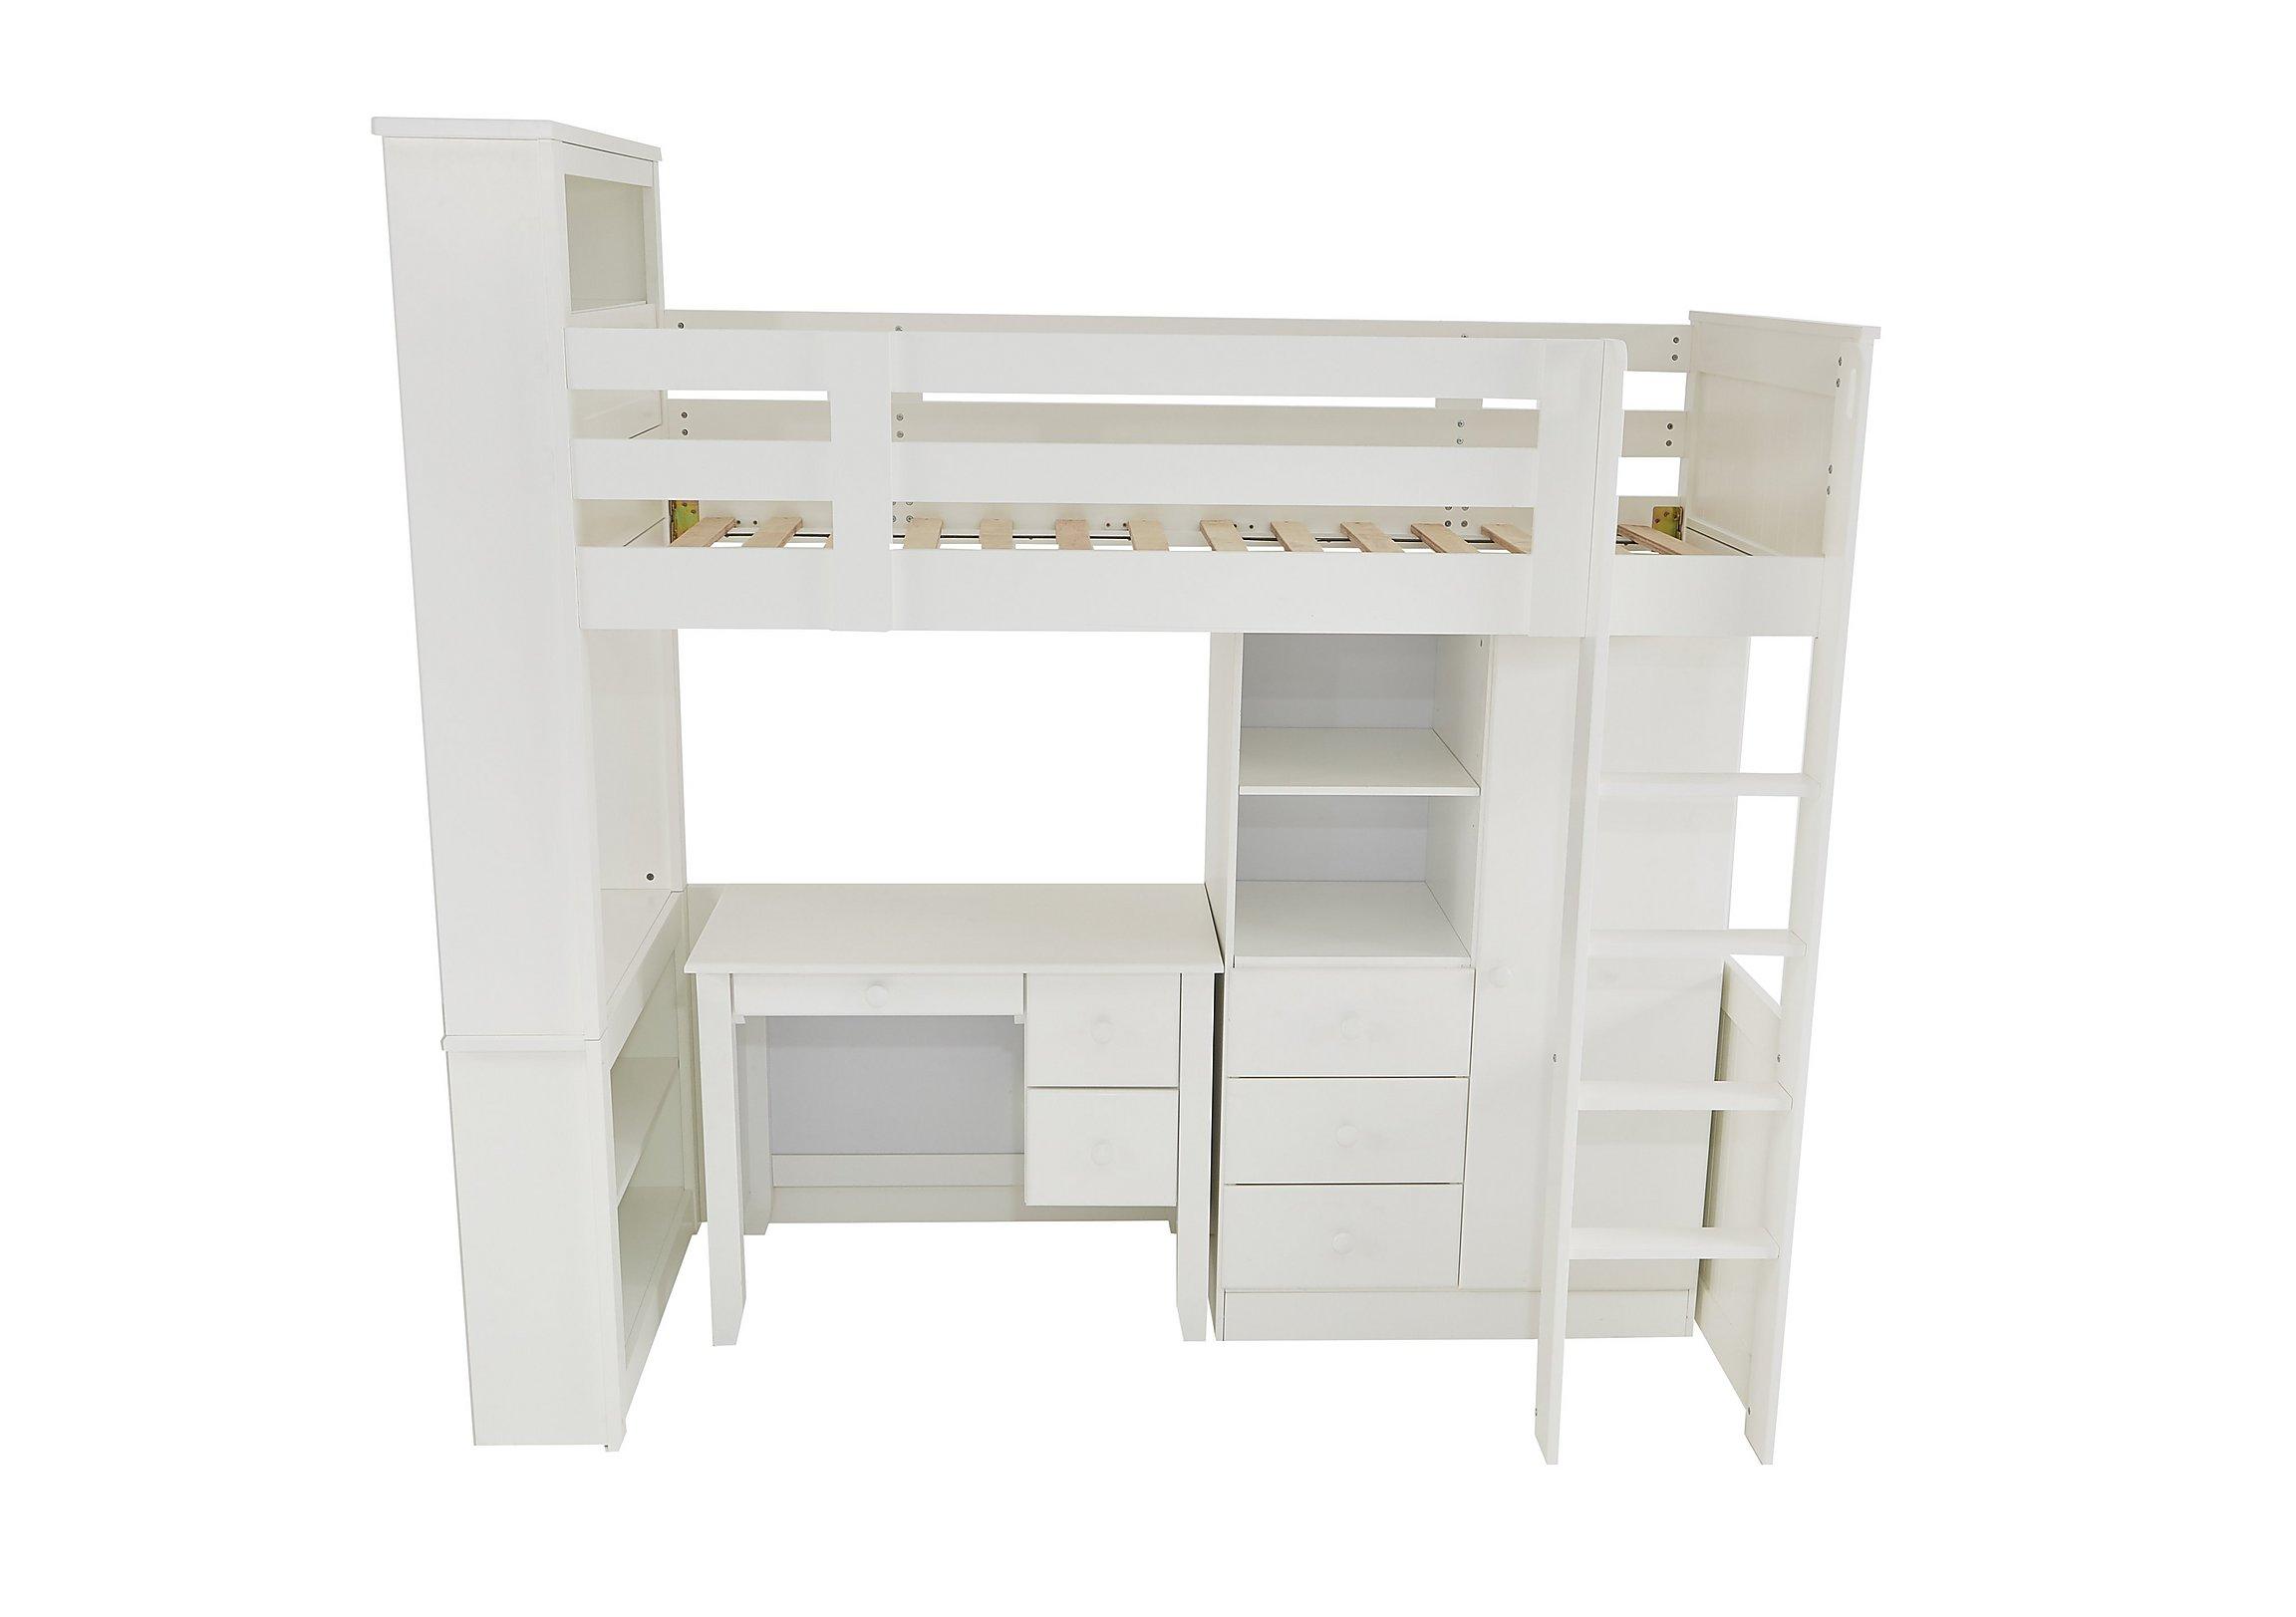 Bed with a desk wardrobe versatile children go bed under table - Save 540